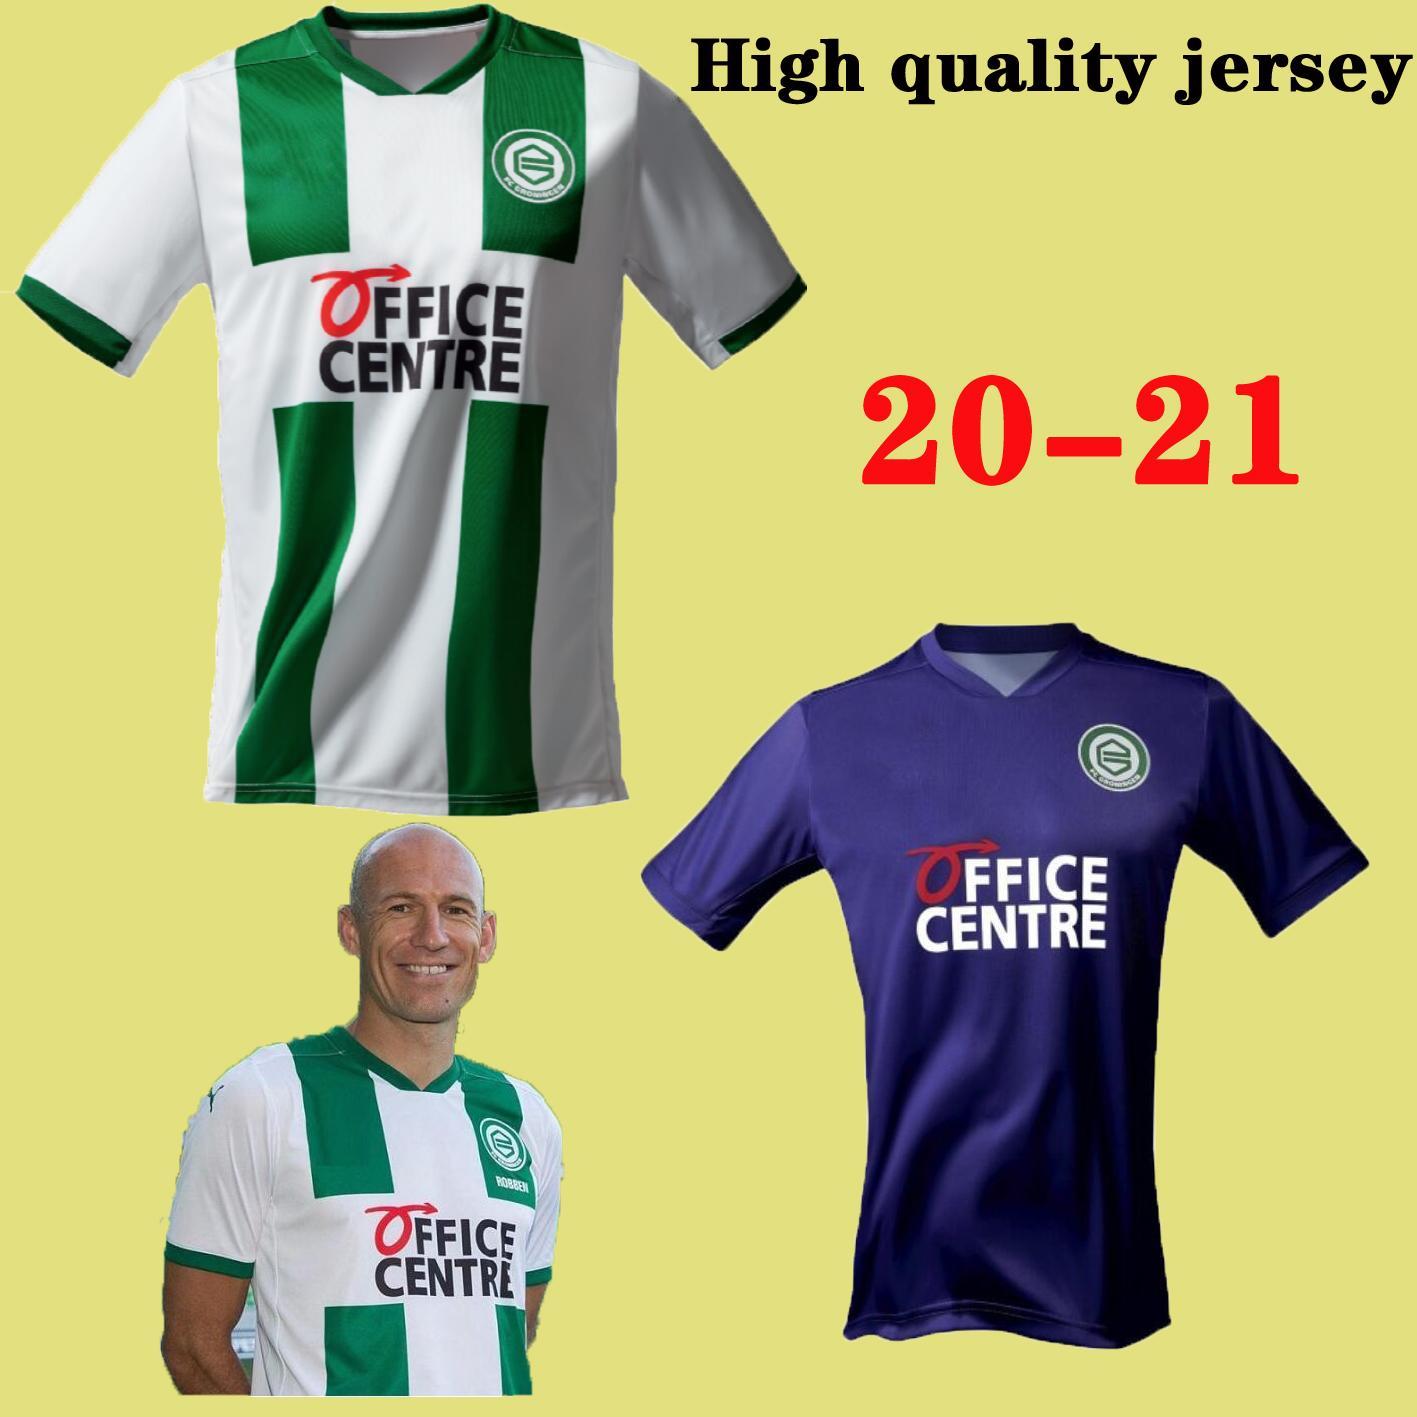 2021 Groningen Futbol Jersey Ana Robben için 2020 Groningen Deyovaisio Zeefuik Daishawn Redan Futbol Klasik tişört